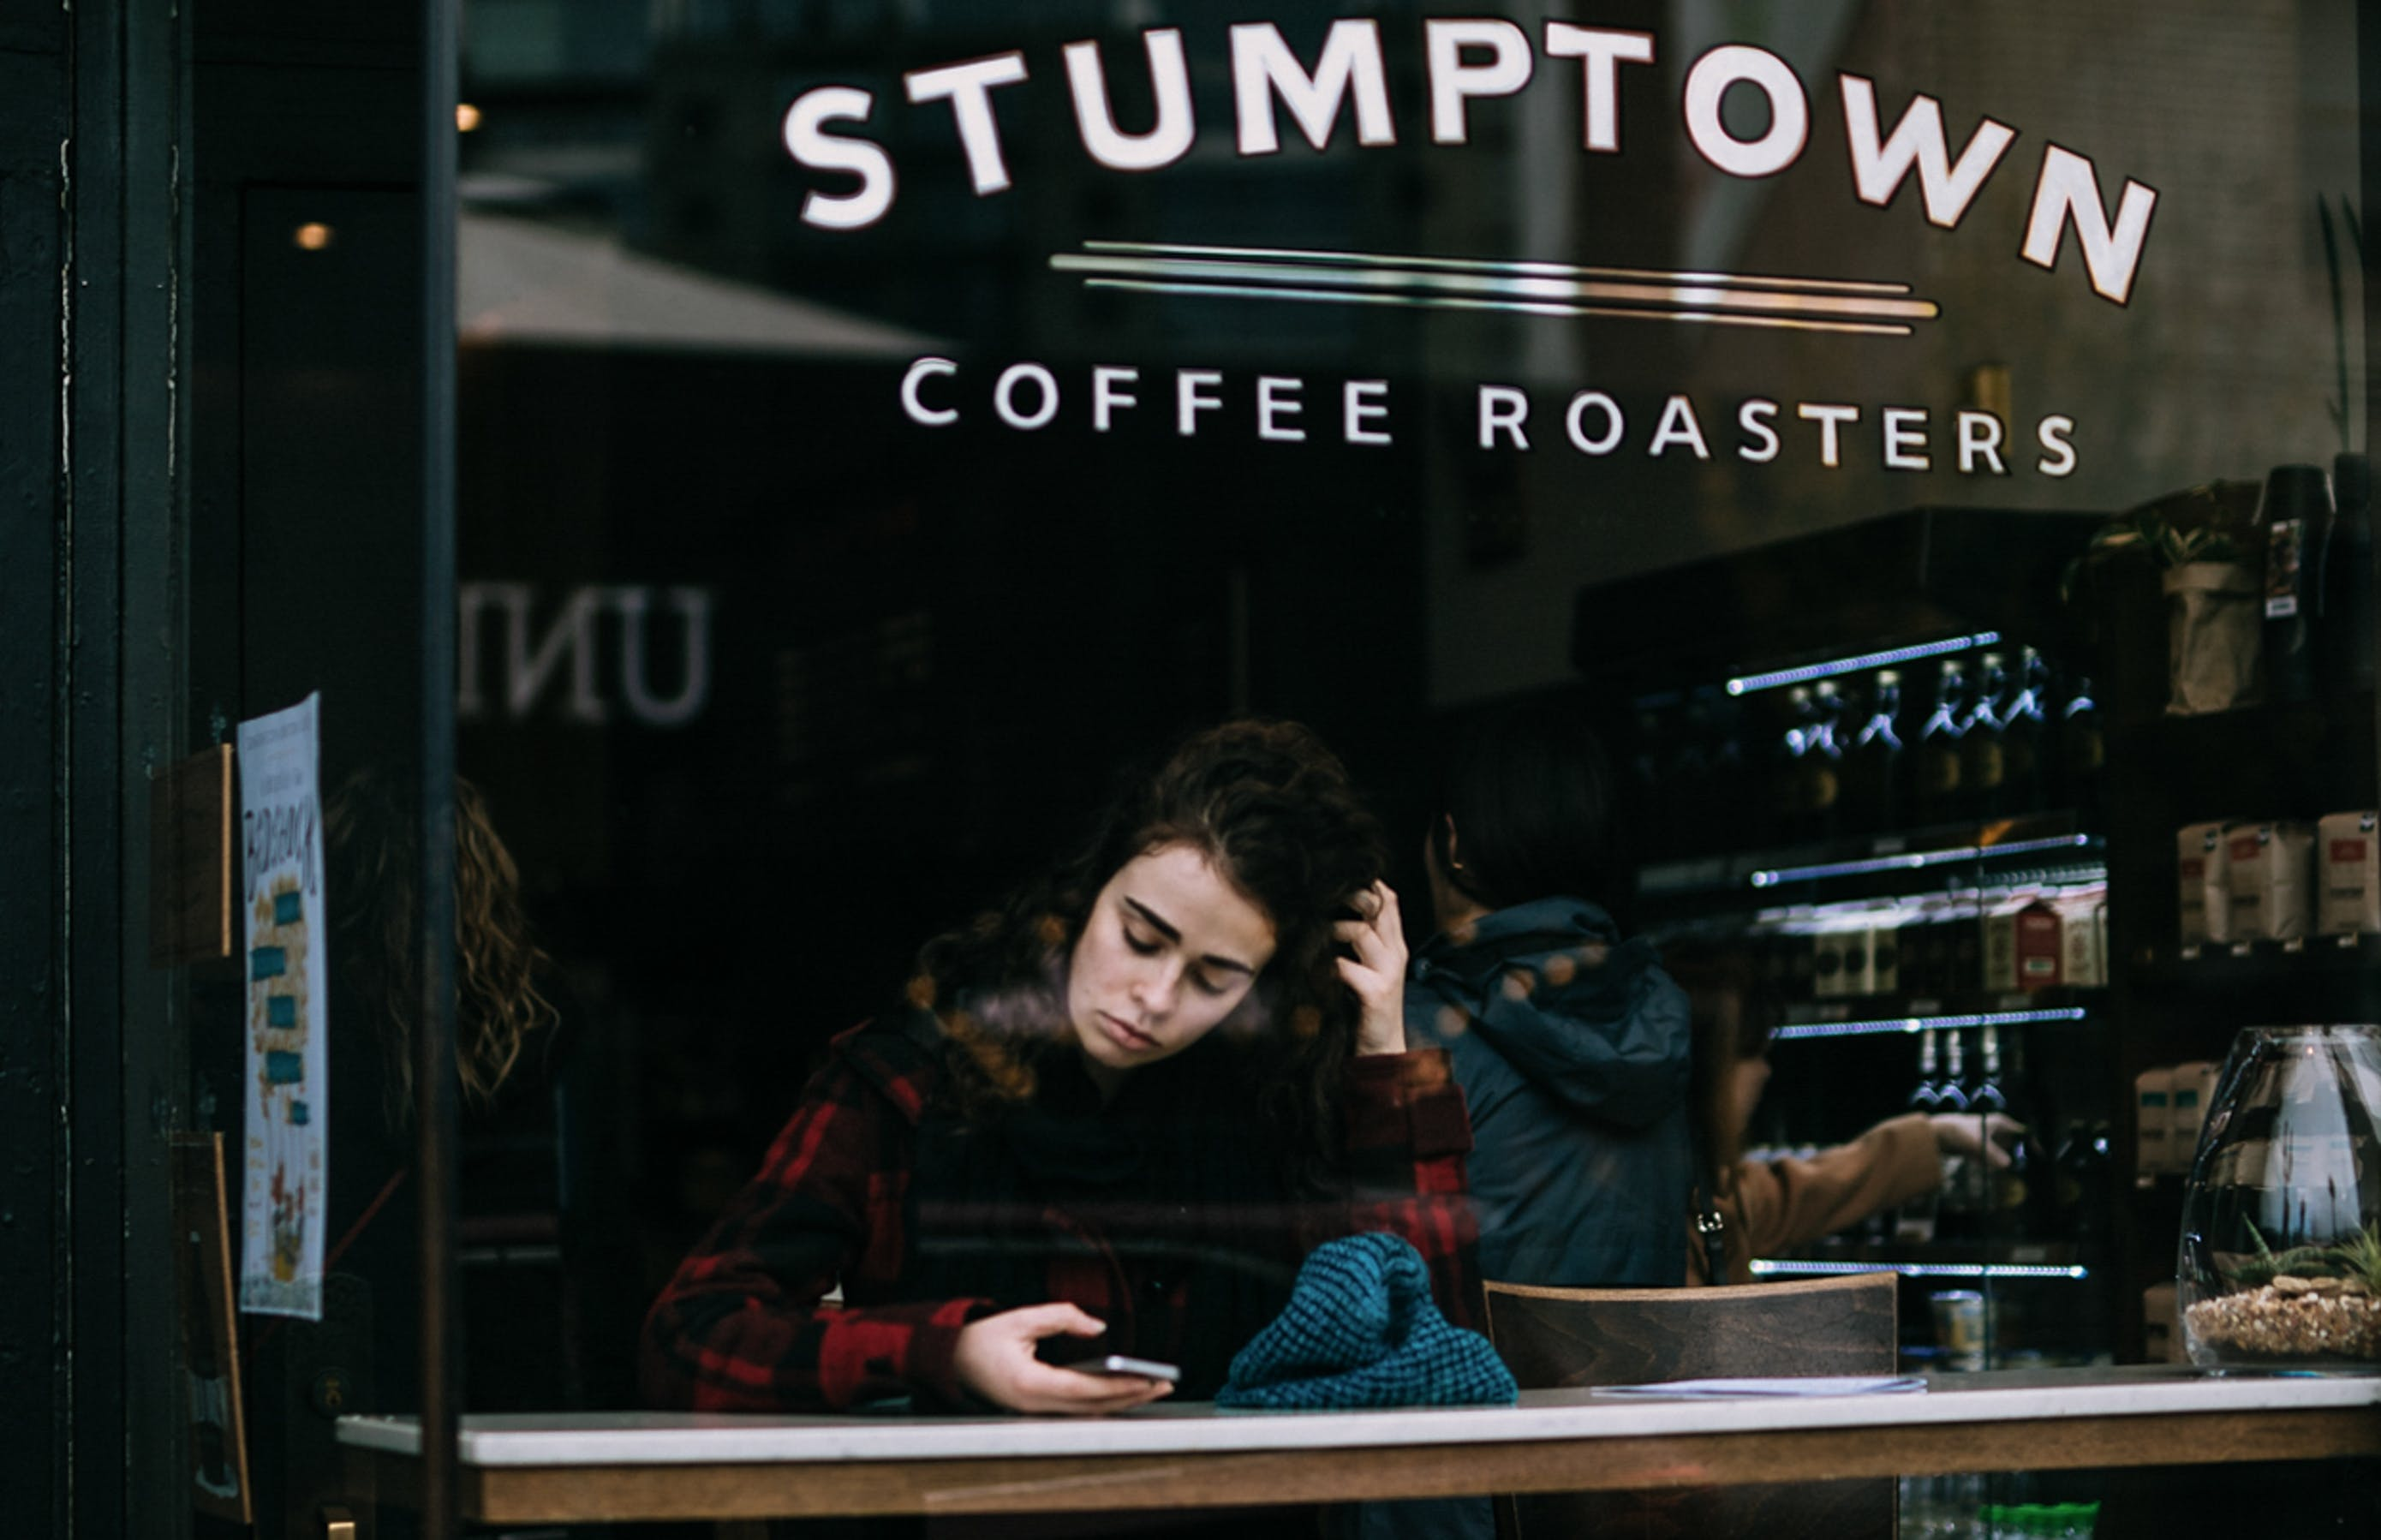 Woman Sitting Inside Stumptown Establishment